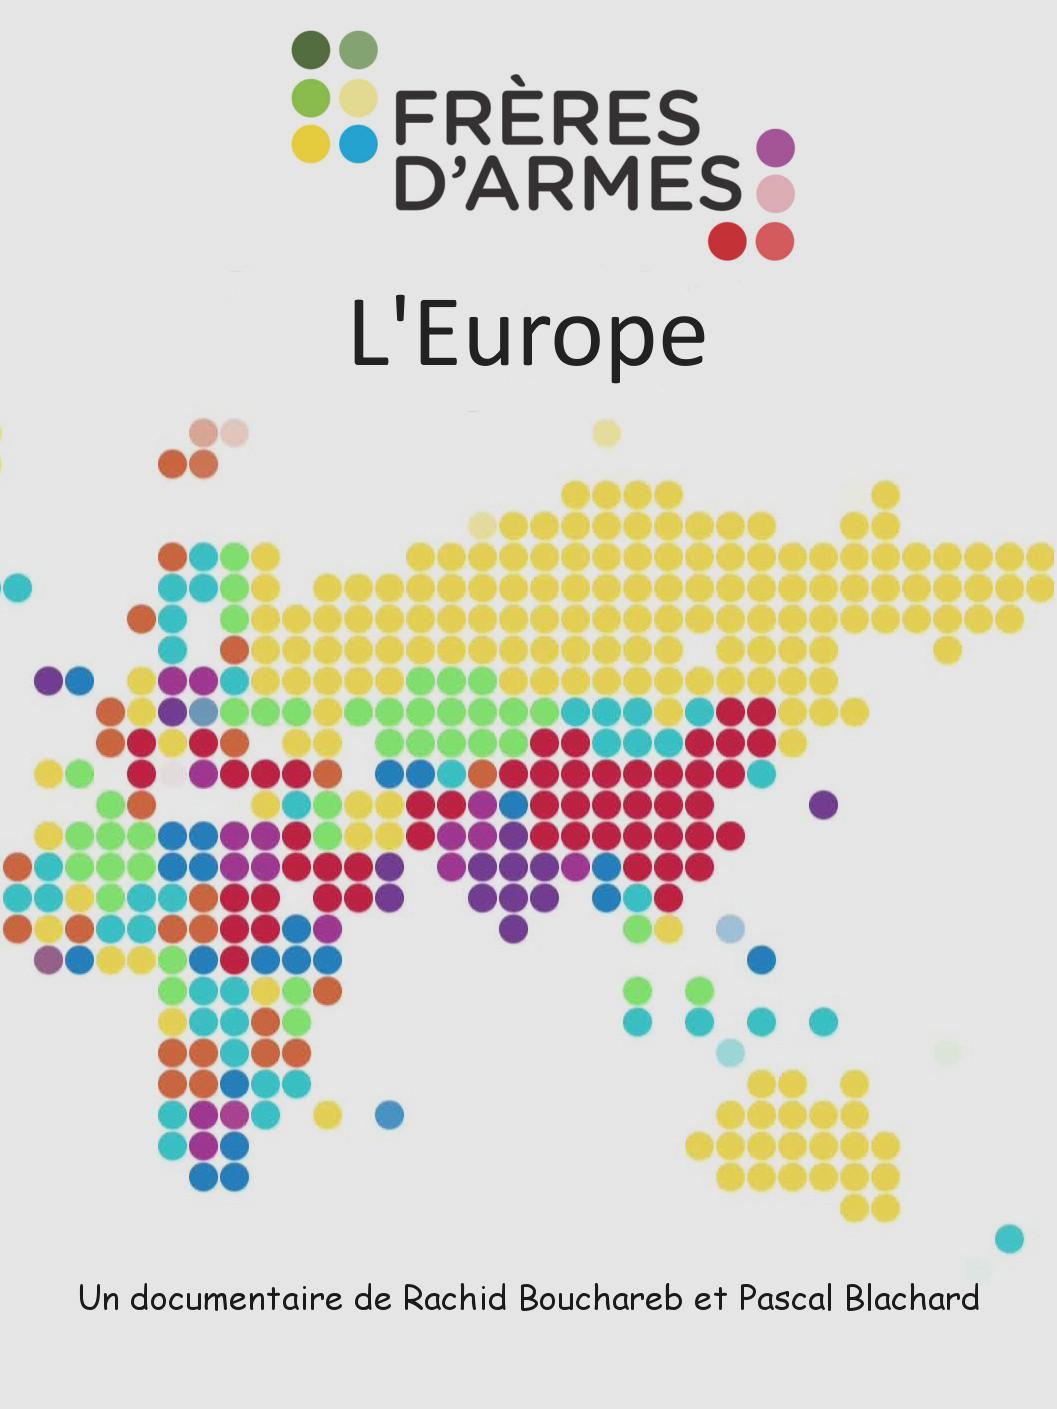 Frères d'armes : Europe